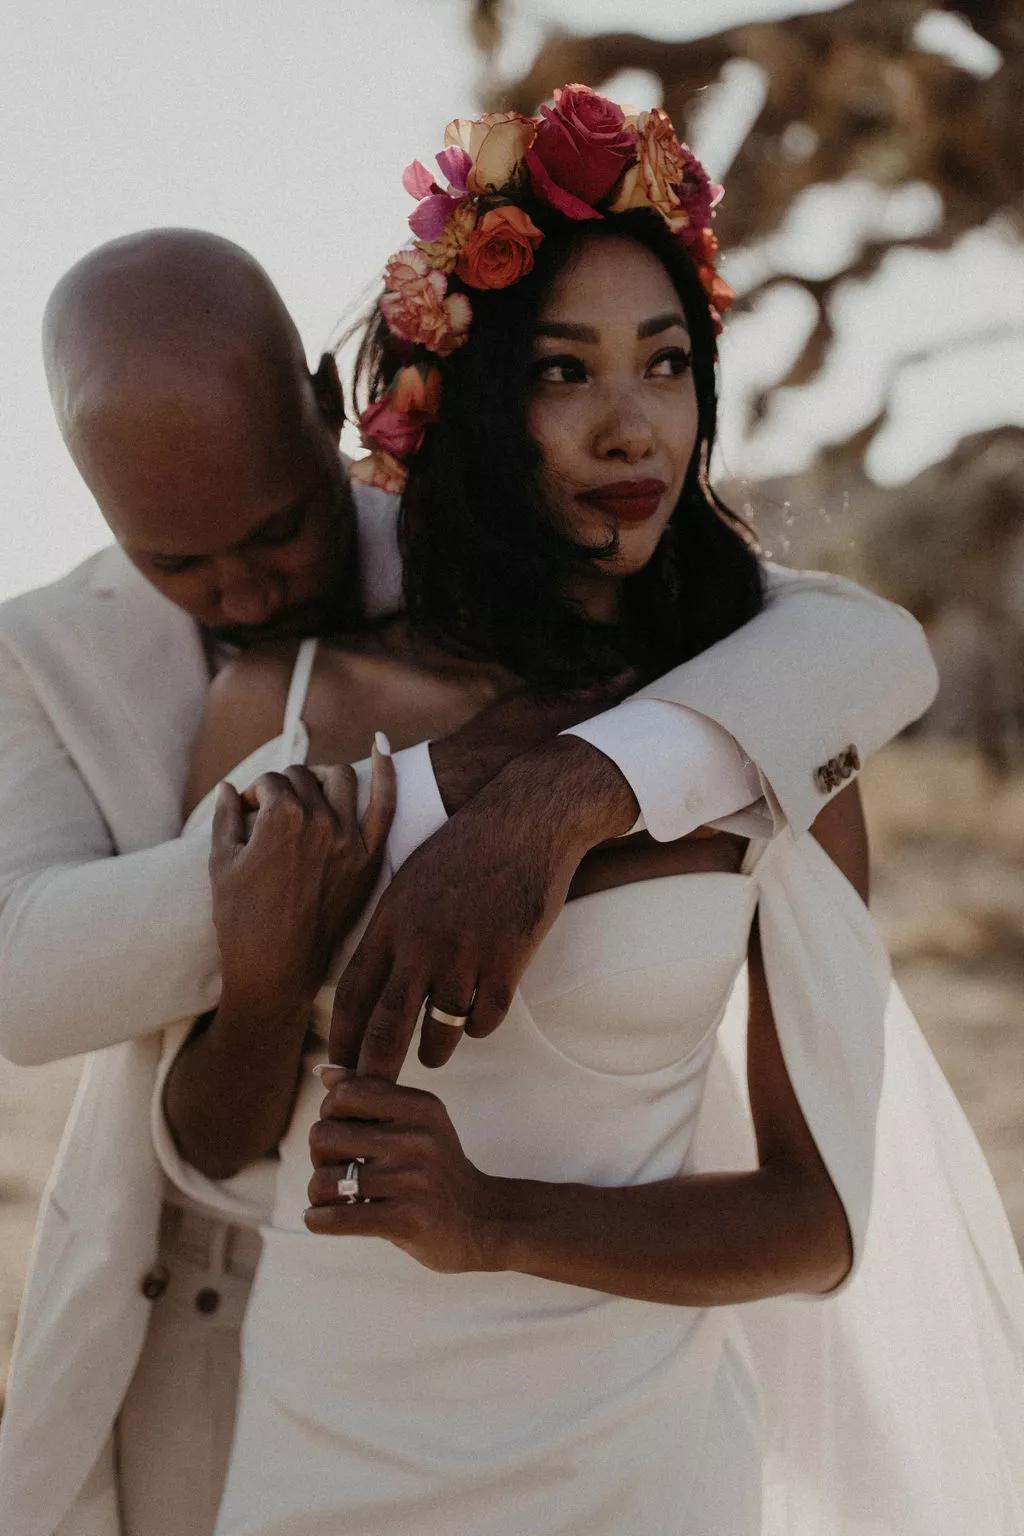 Klii iNx4xA - Найти свадебного ведущего оказалось проще простого